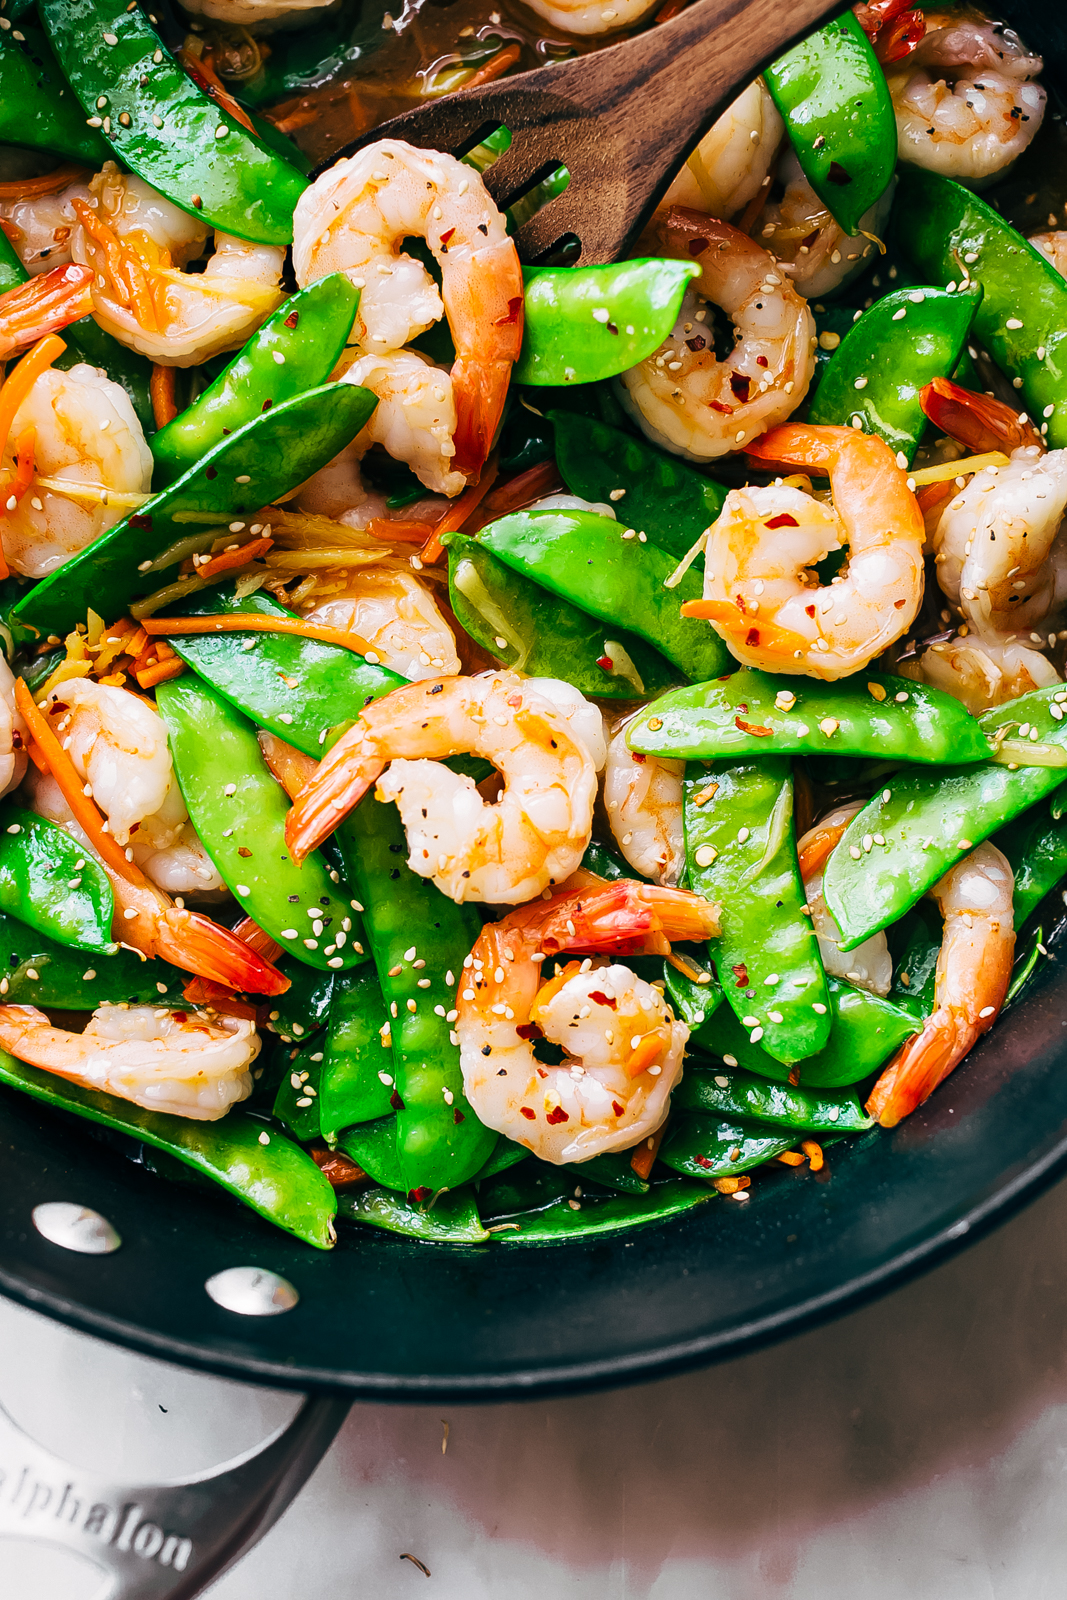 close up of shrimp stir fry showing curved shrimp and bright green snow peas